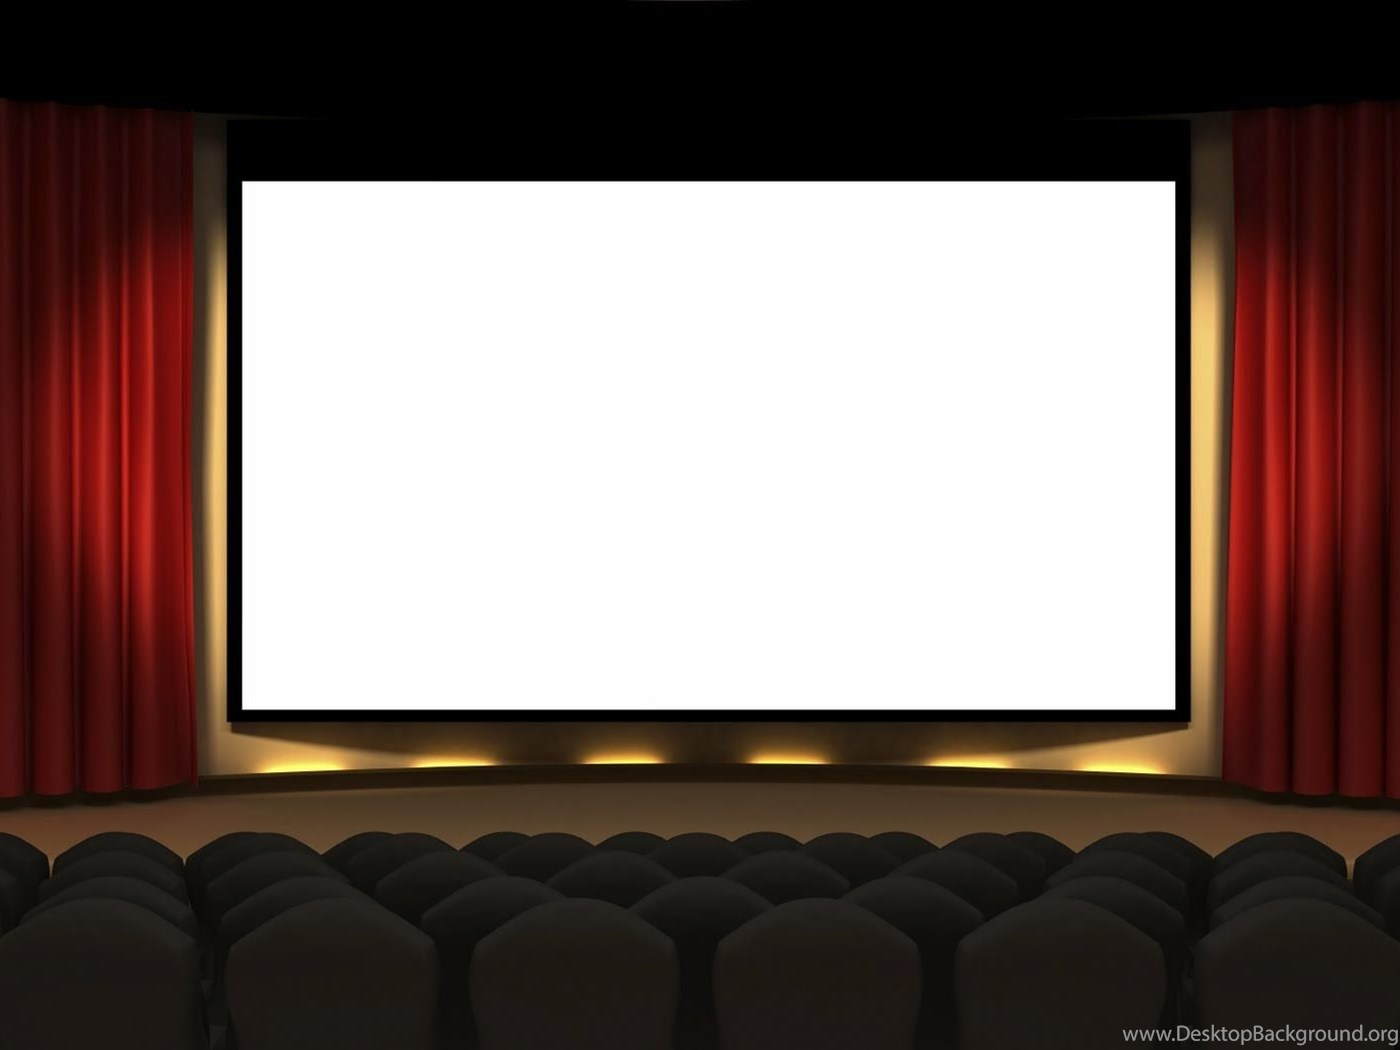 Theater backgrounds desktop background fullscreen voltagebd Choice Image